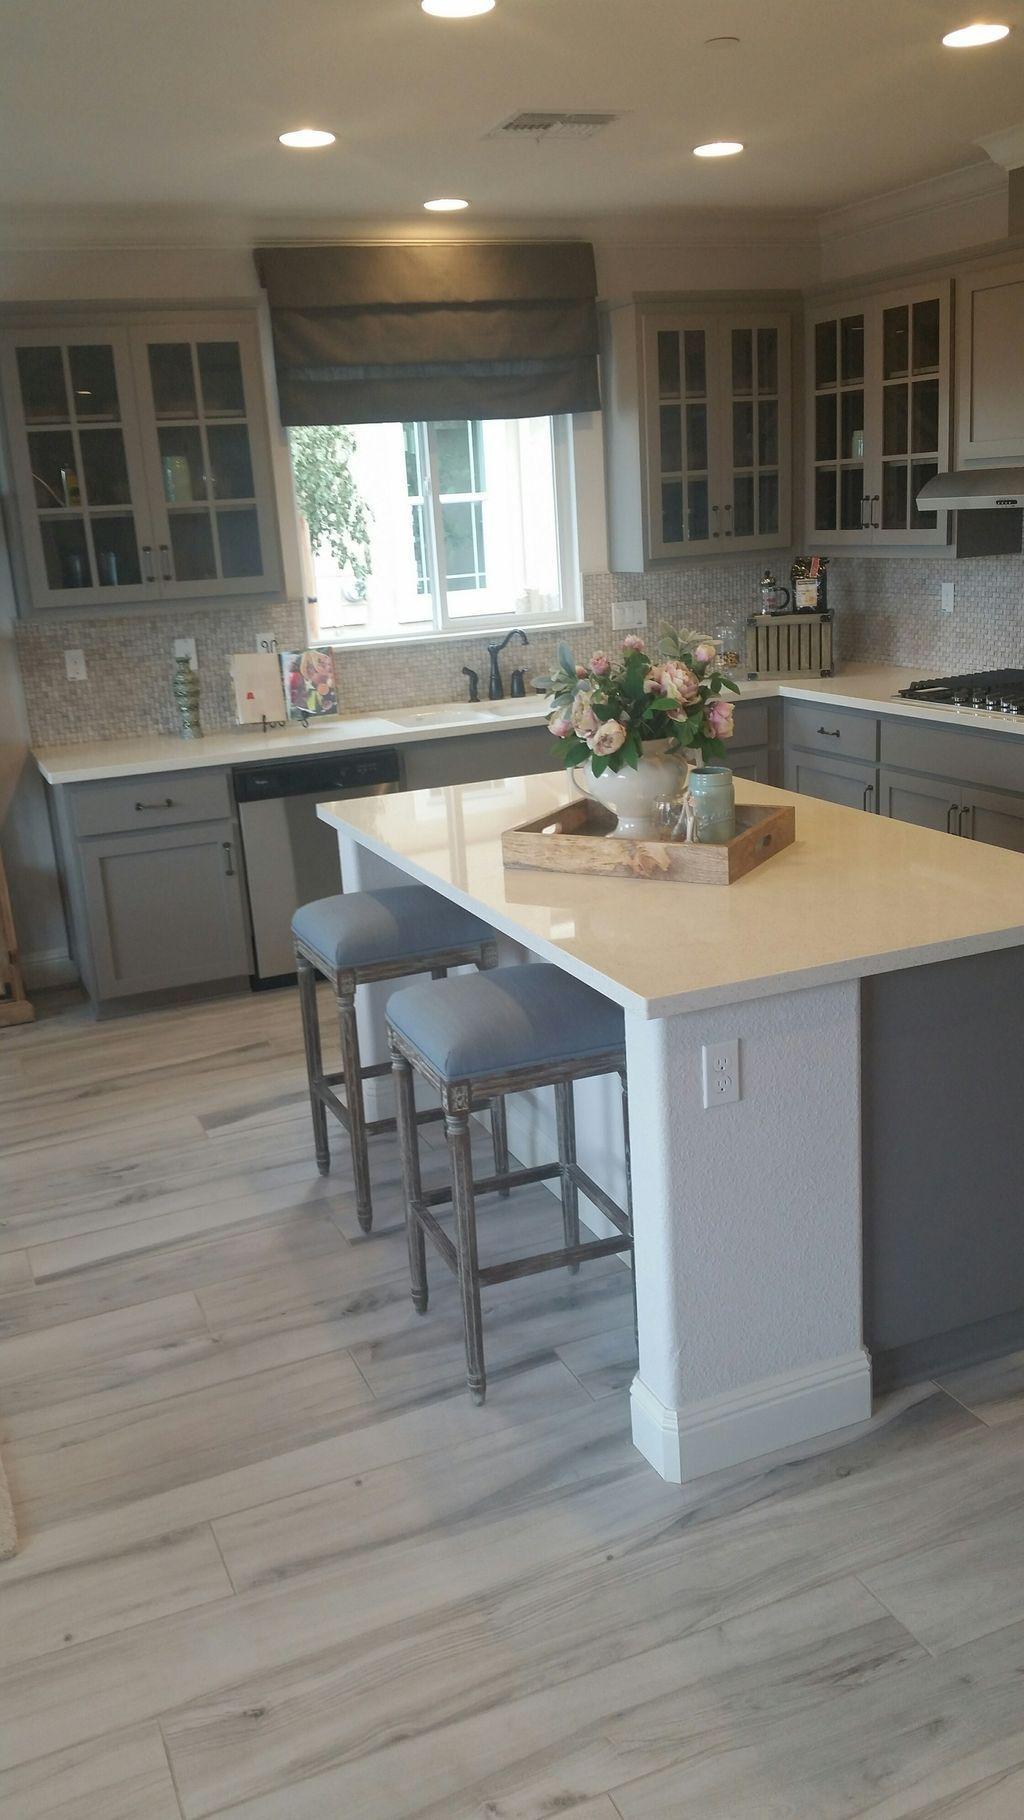 50 Stylish Gray And White Kitchen Ideas 24 Kitchen Cabinet Remodel Farmhouse Kitchen Cabinets Kitchen Floor Tile